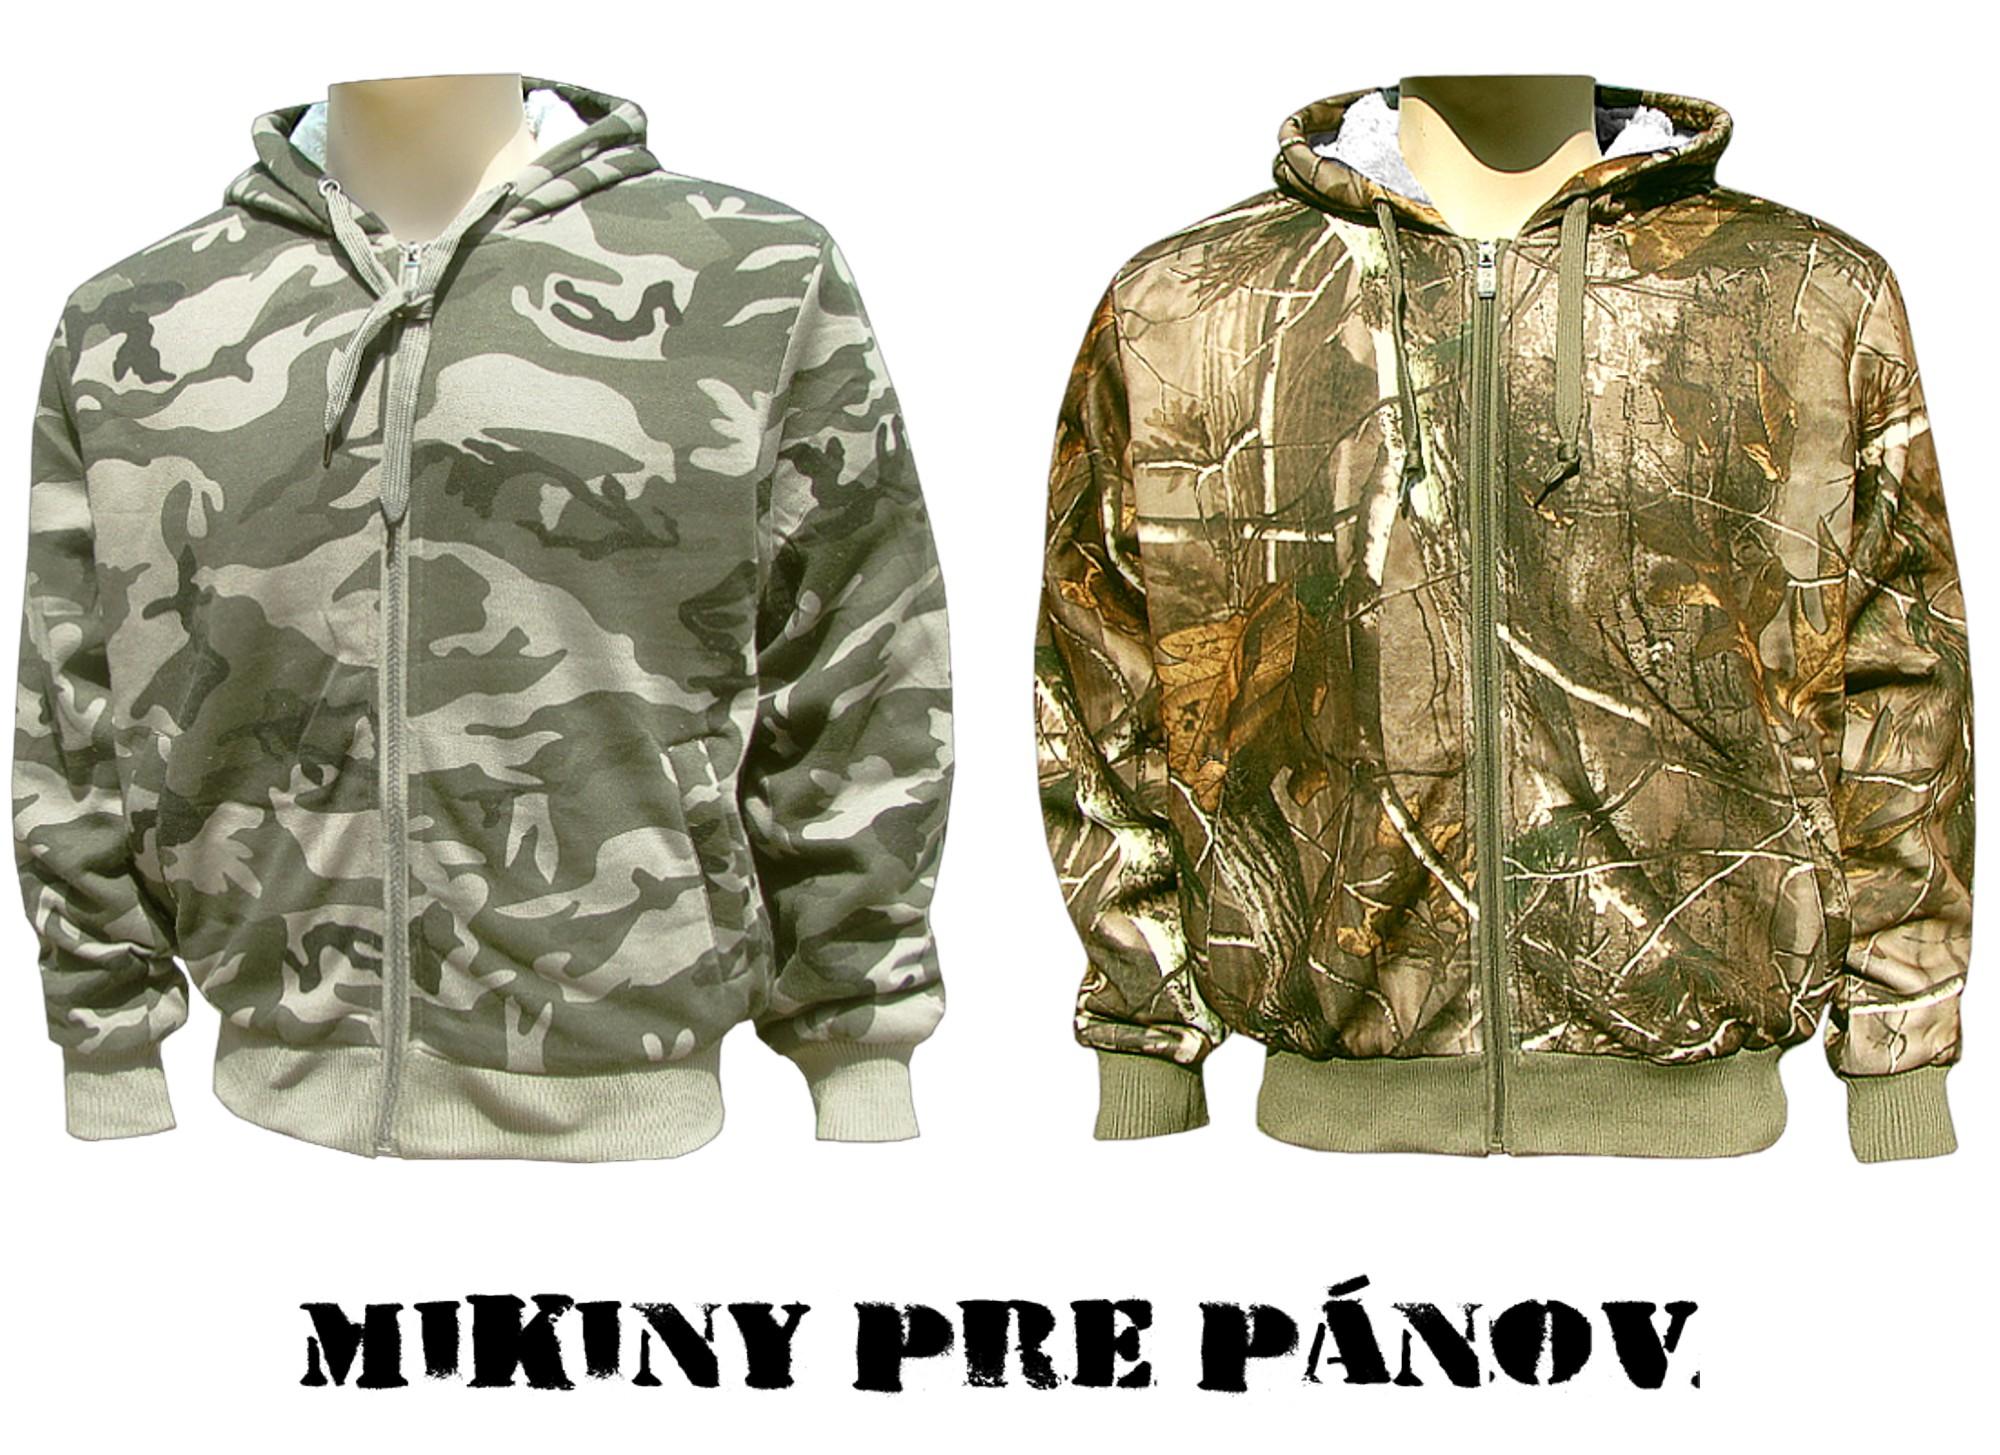 fbf3d2e141d6 Lacné pánske mikiny - armyshop a veľkoobchod Pánske mikiny za super cena - veľkoobchod  online